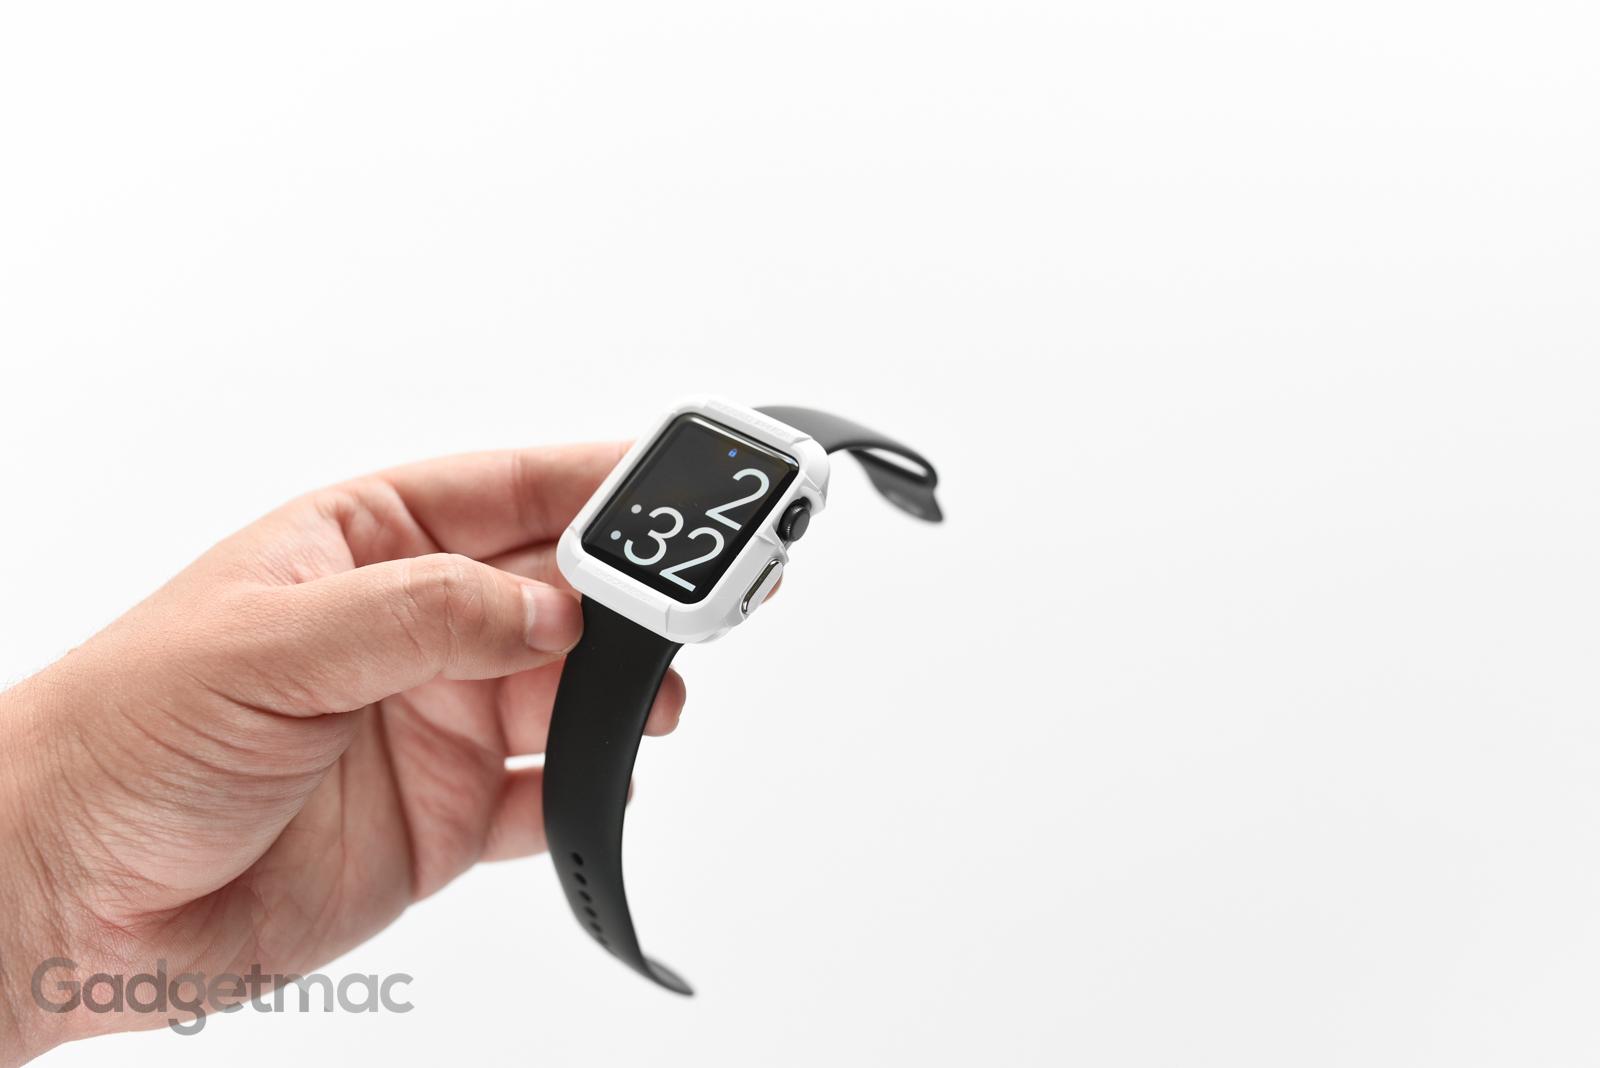 spigen-apple-watch-white-rugged-armor-case-side-2.jpg